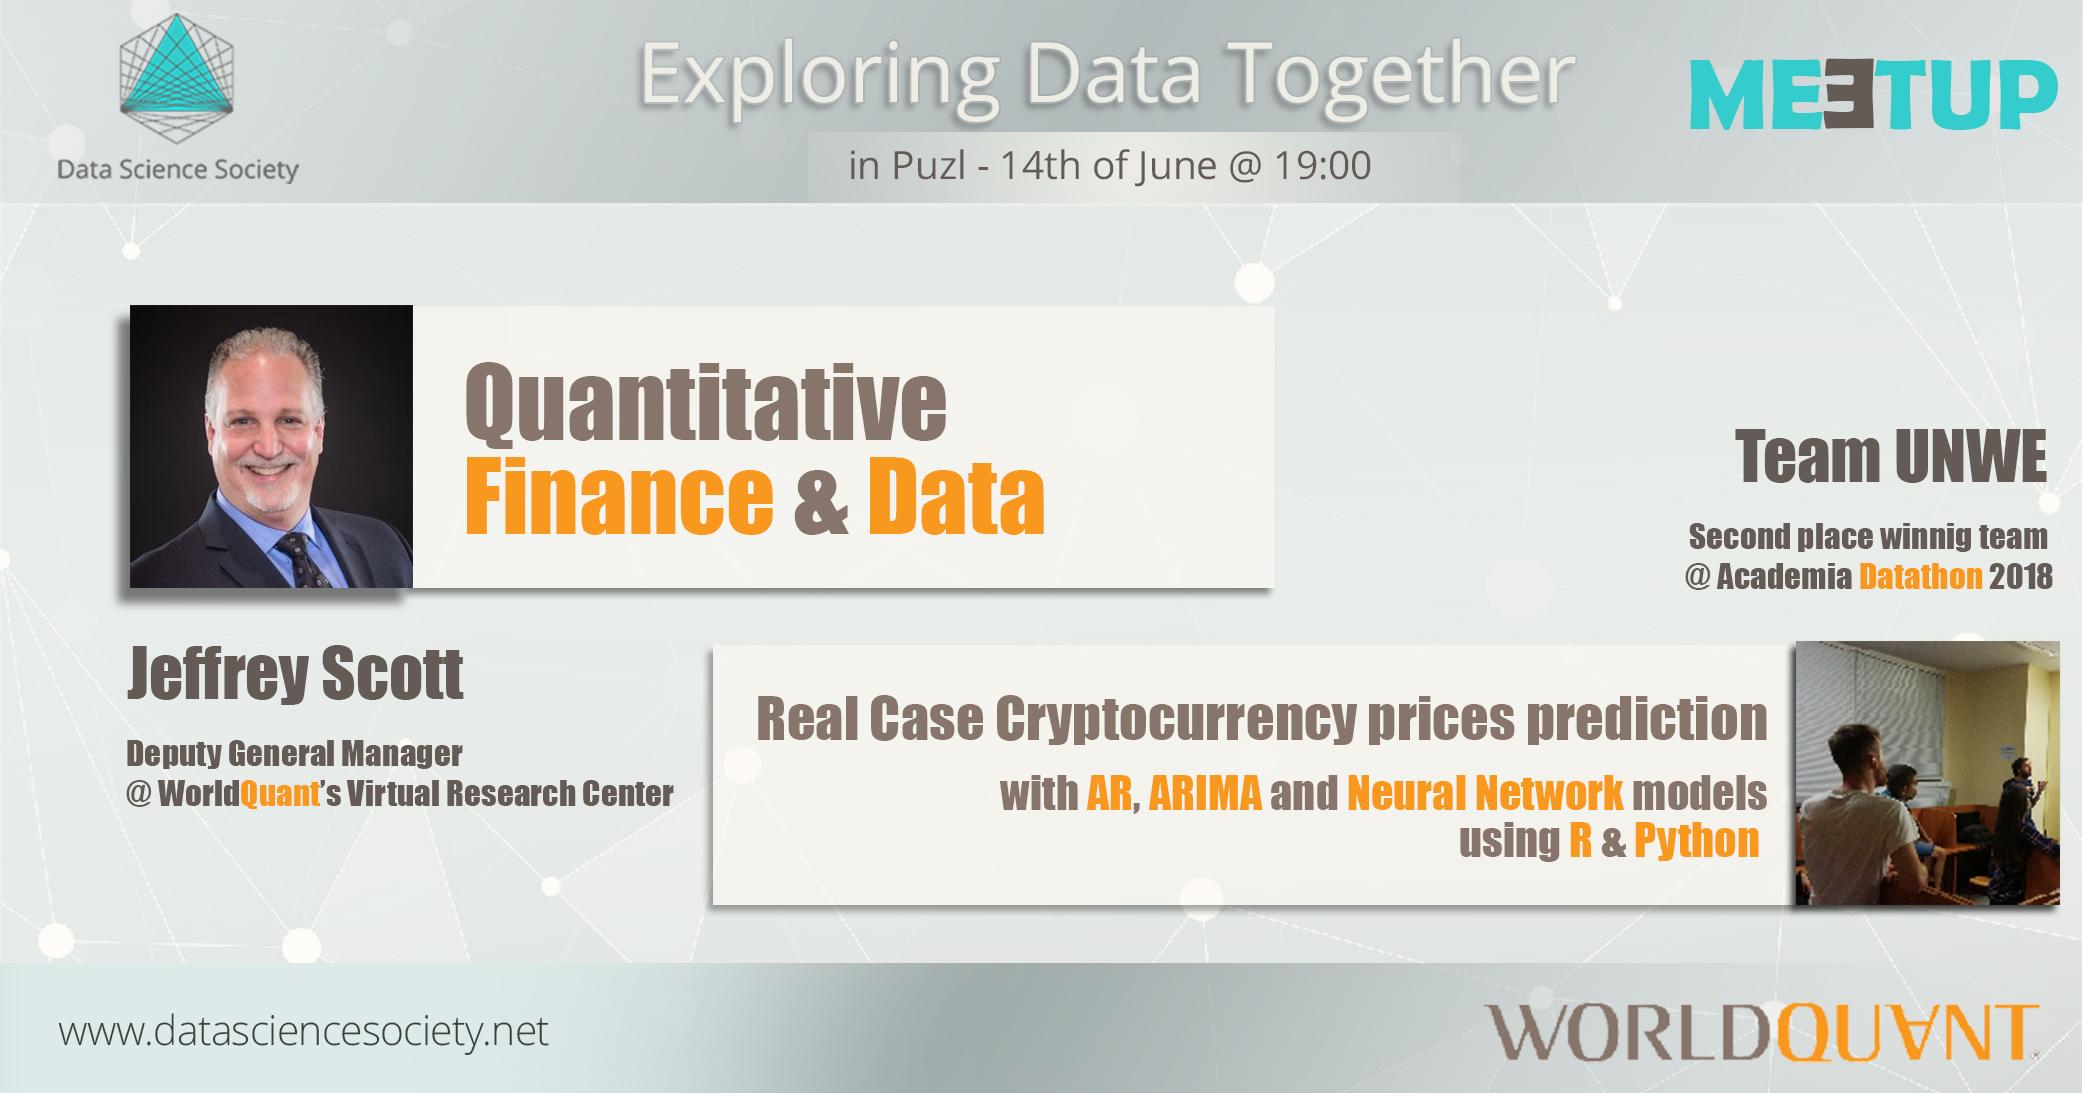 world-quant-data-science-meetup-jeffrey-scott-quantitive-finance-fintech